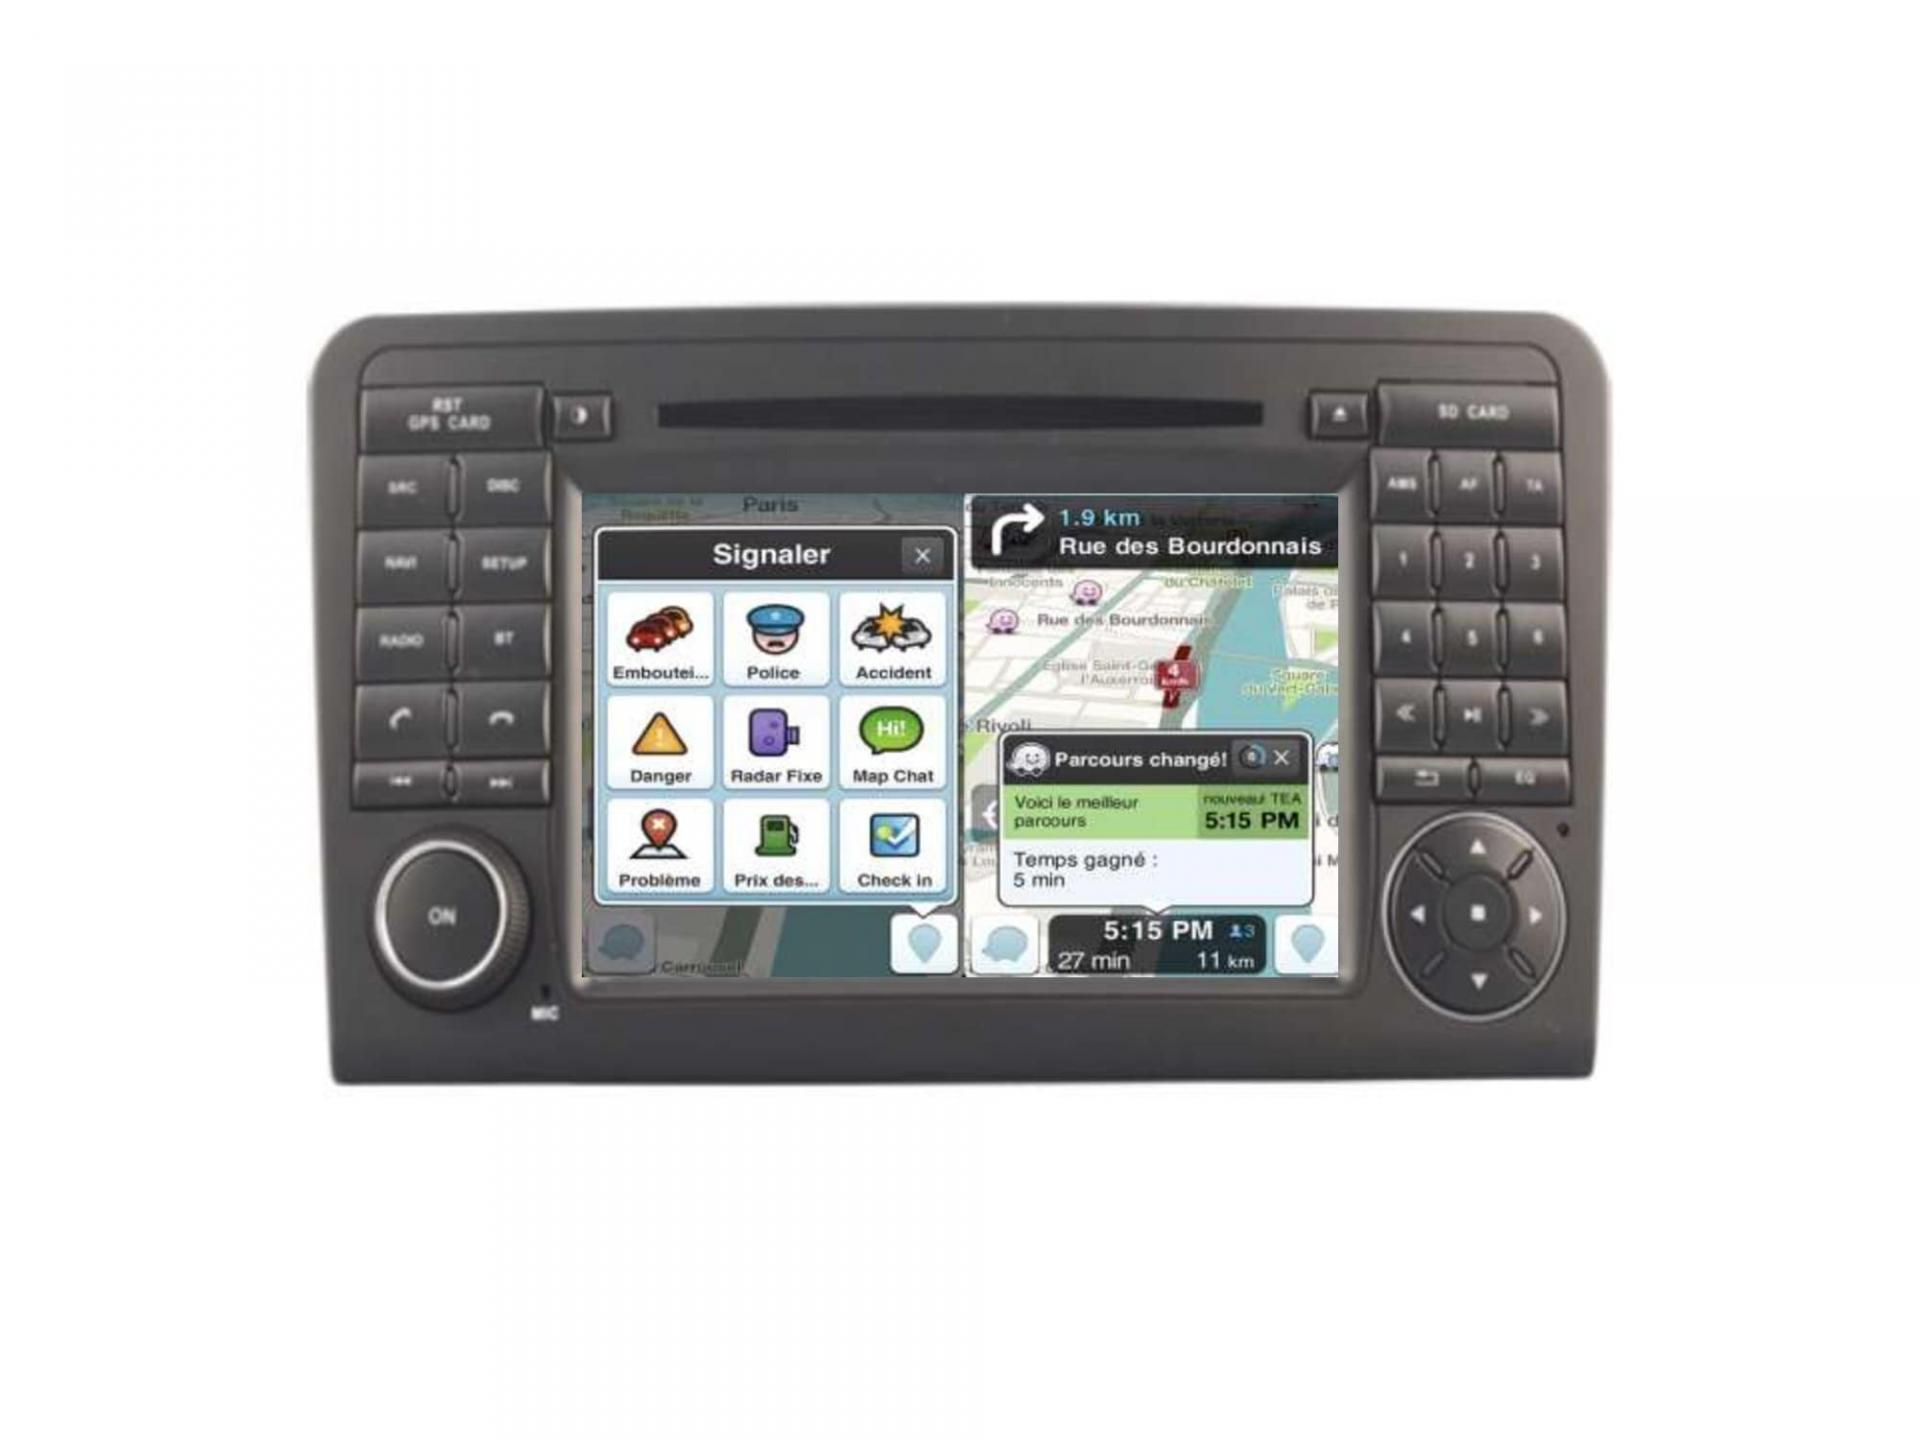 Autoradio gps carplay android auto gps bluetooth mercedes ml w164 3